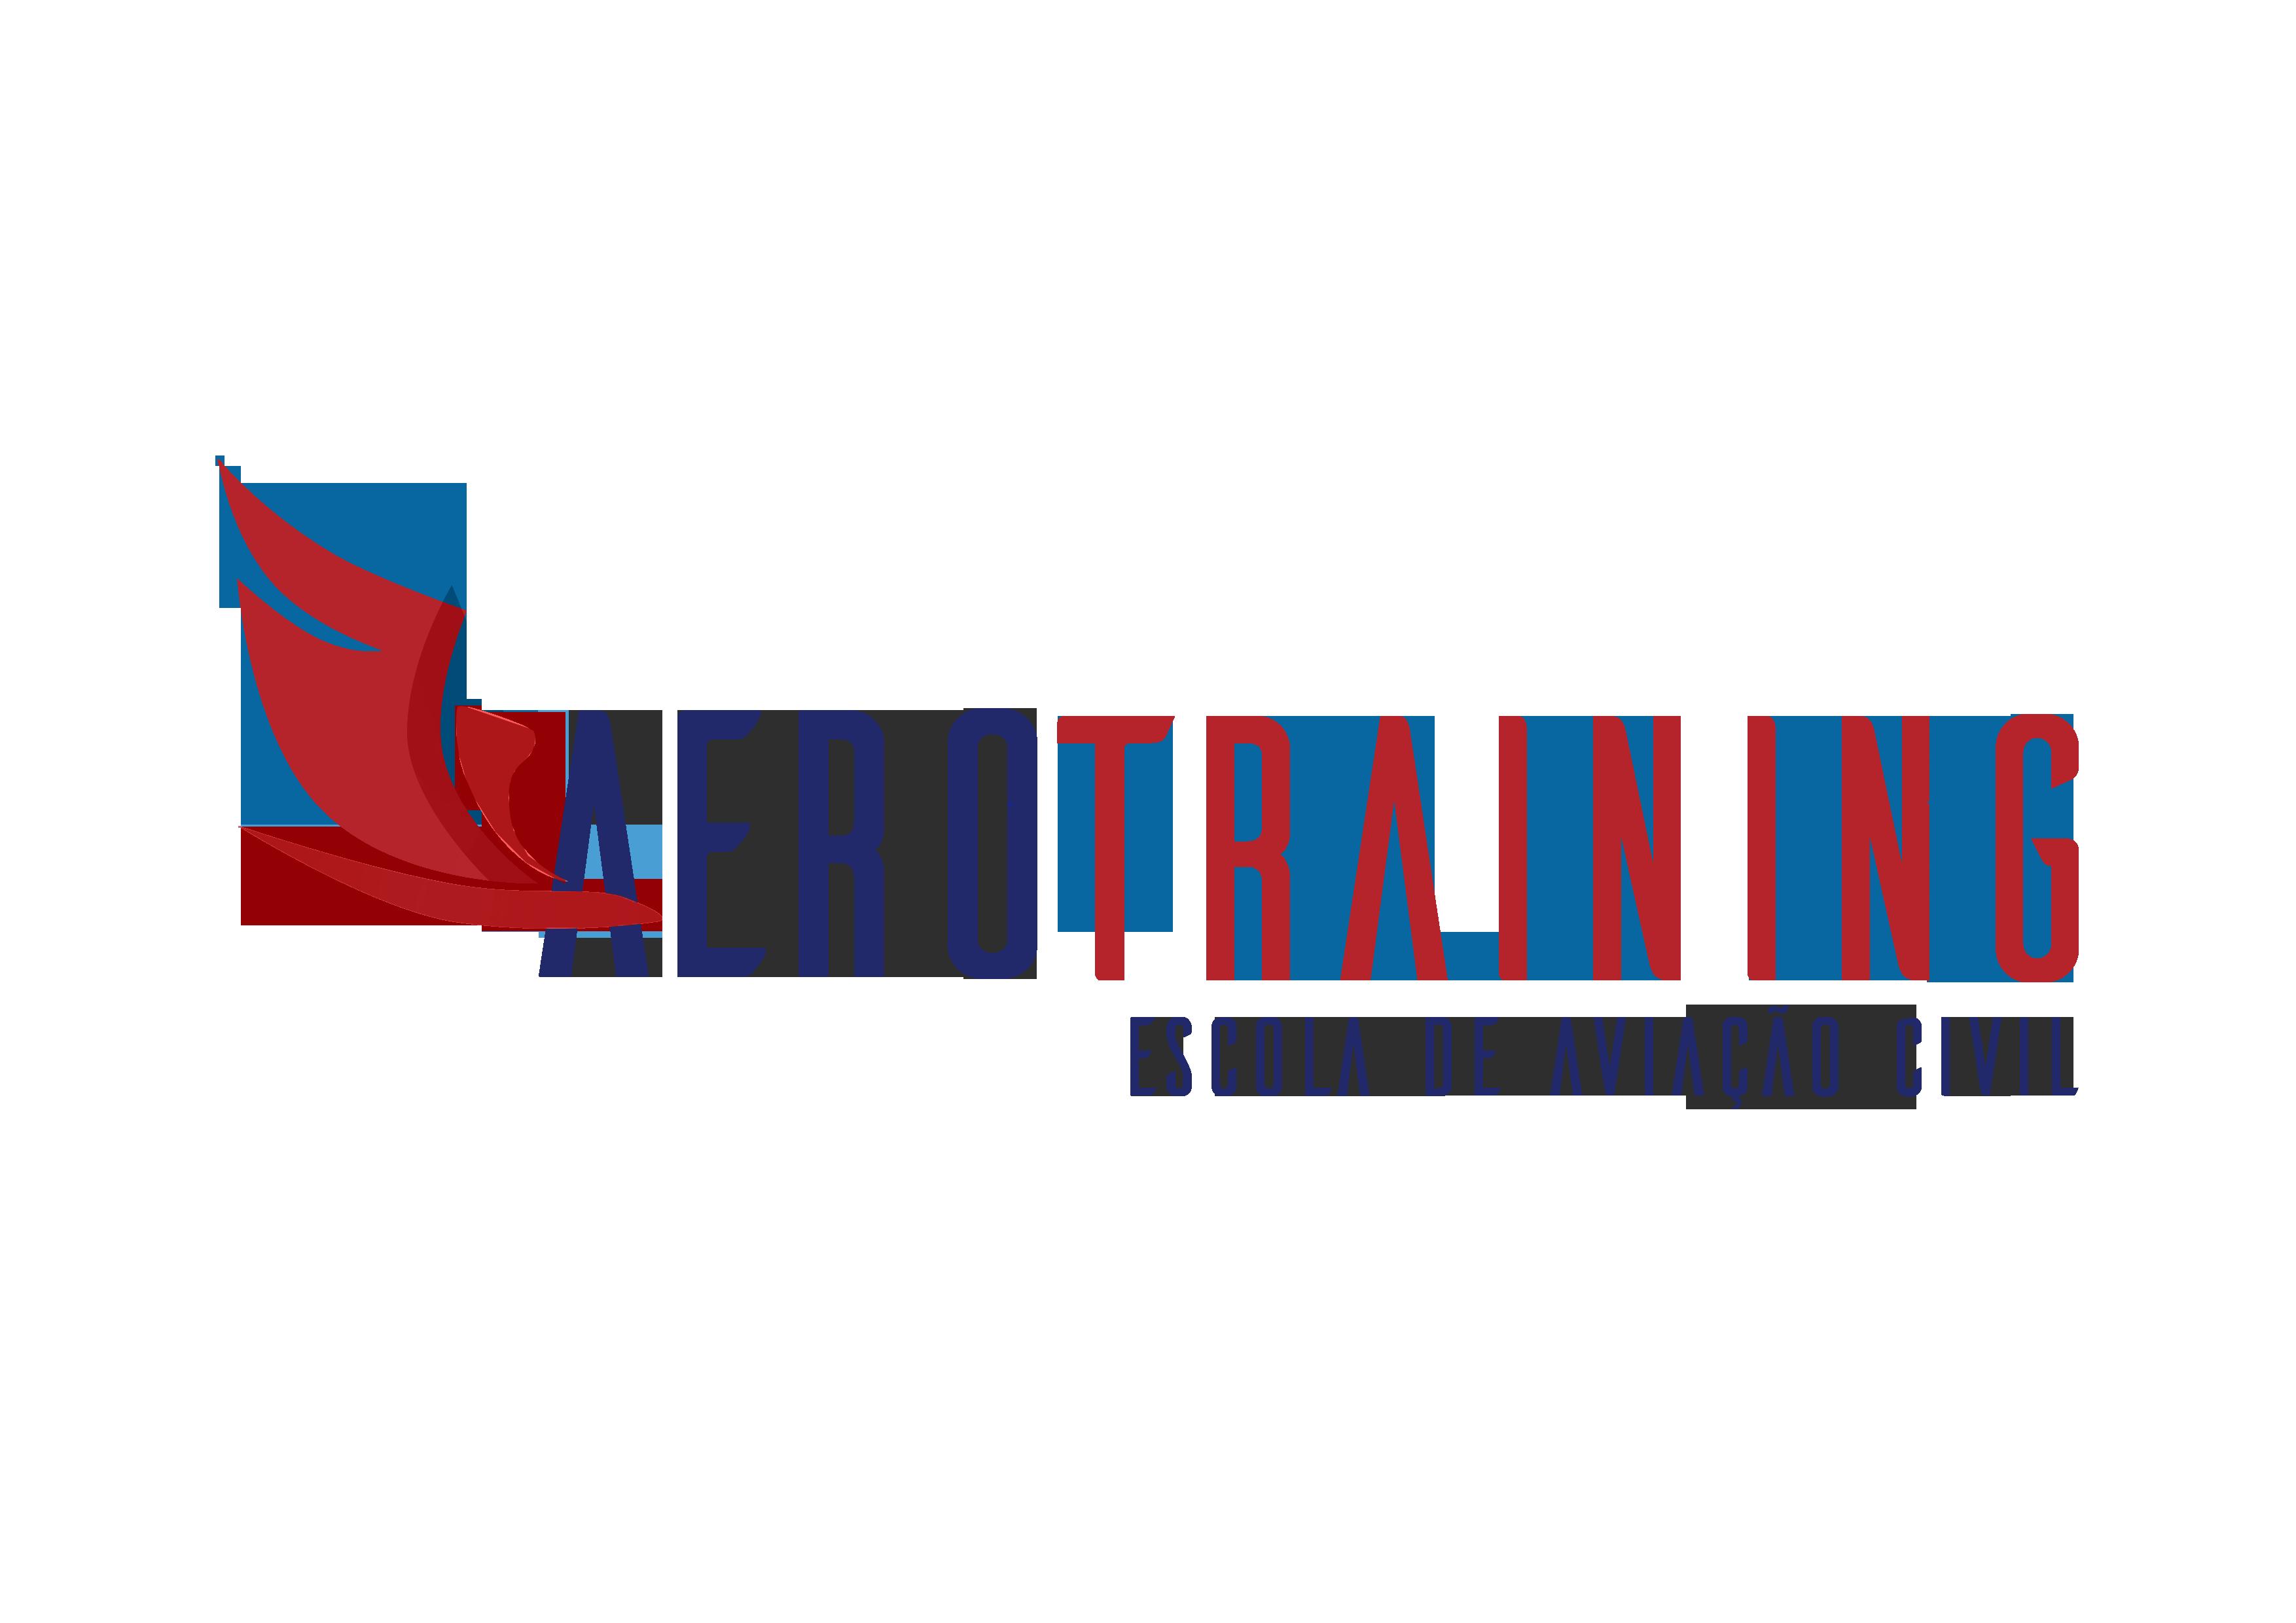 Vetor Aerotraining Horizontal